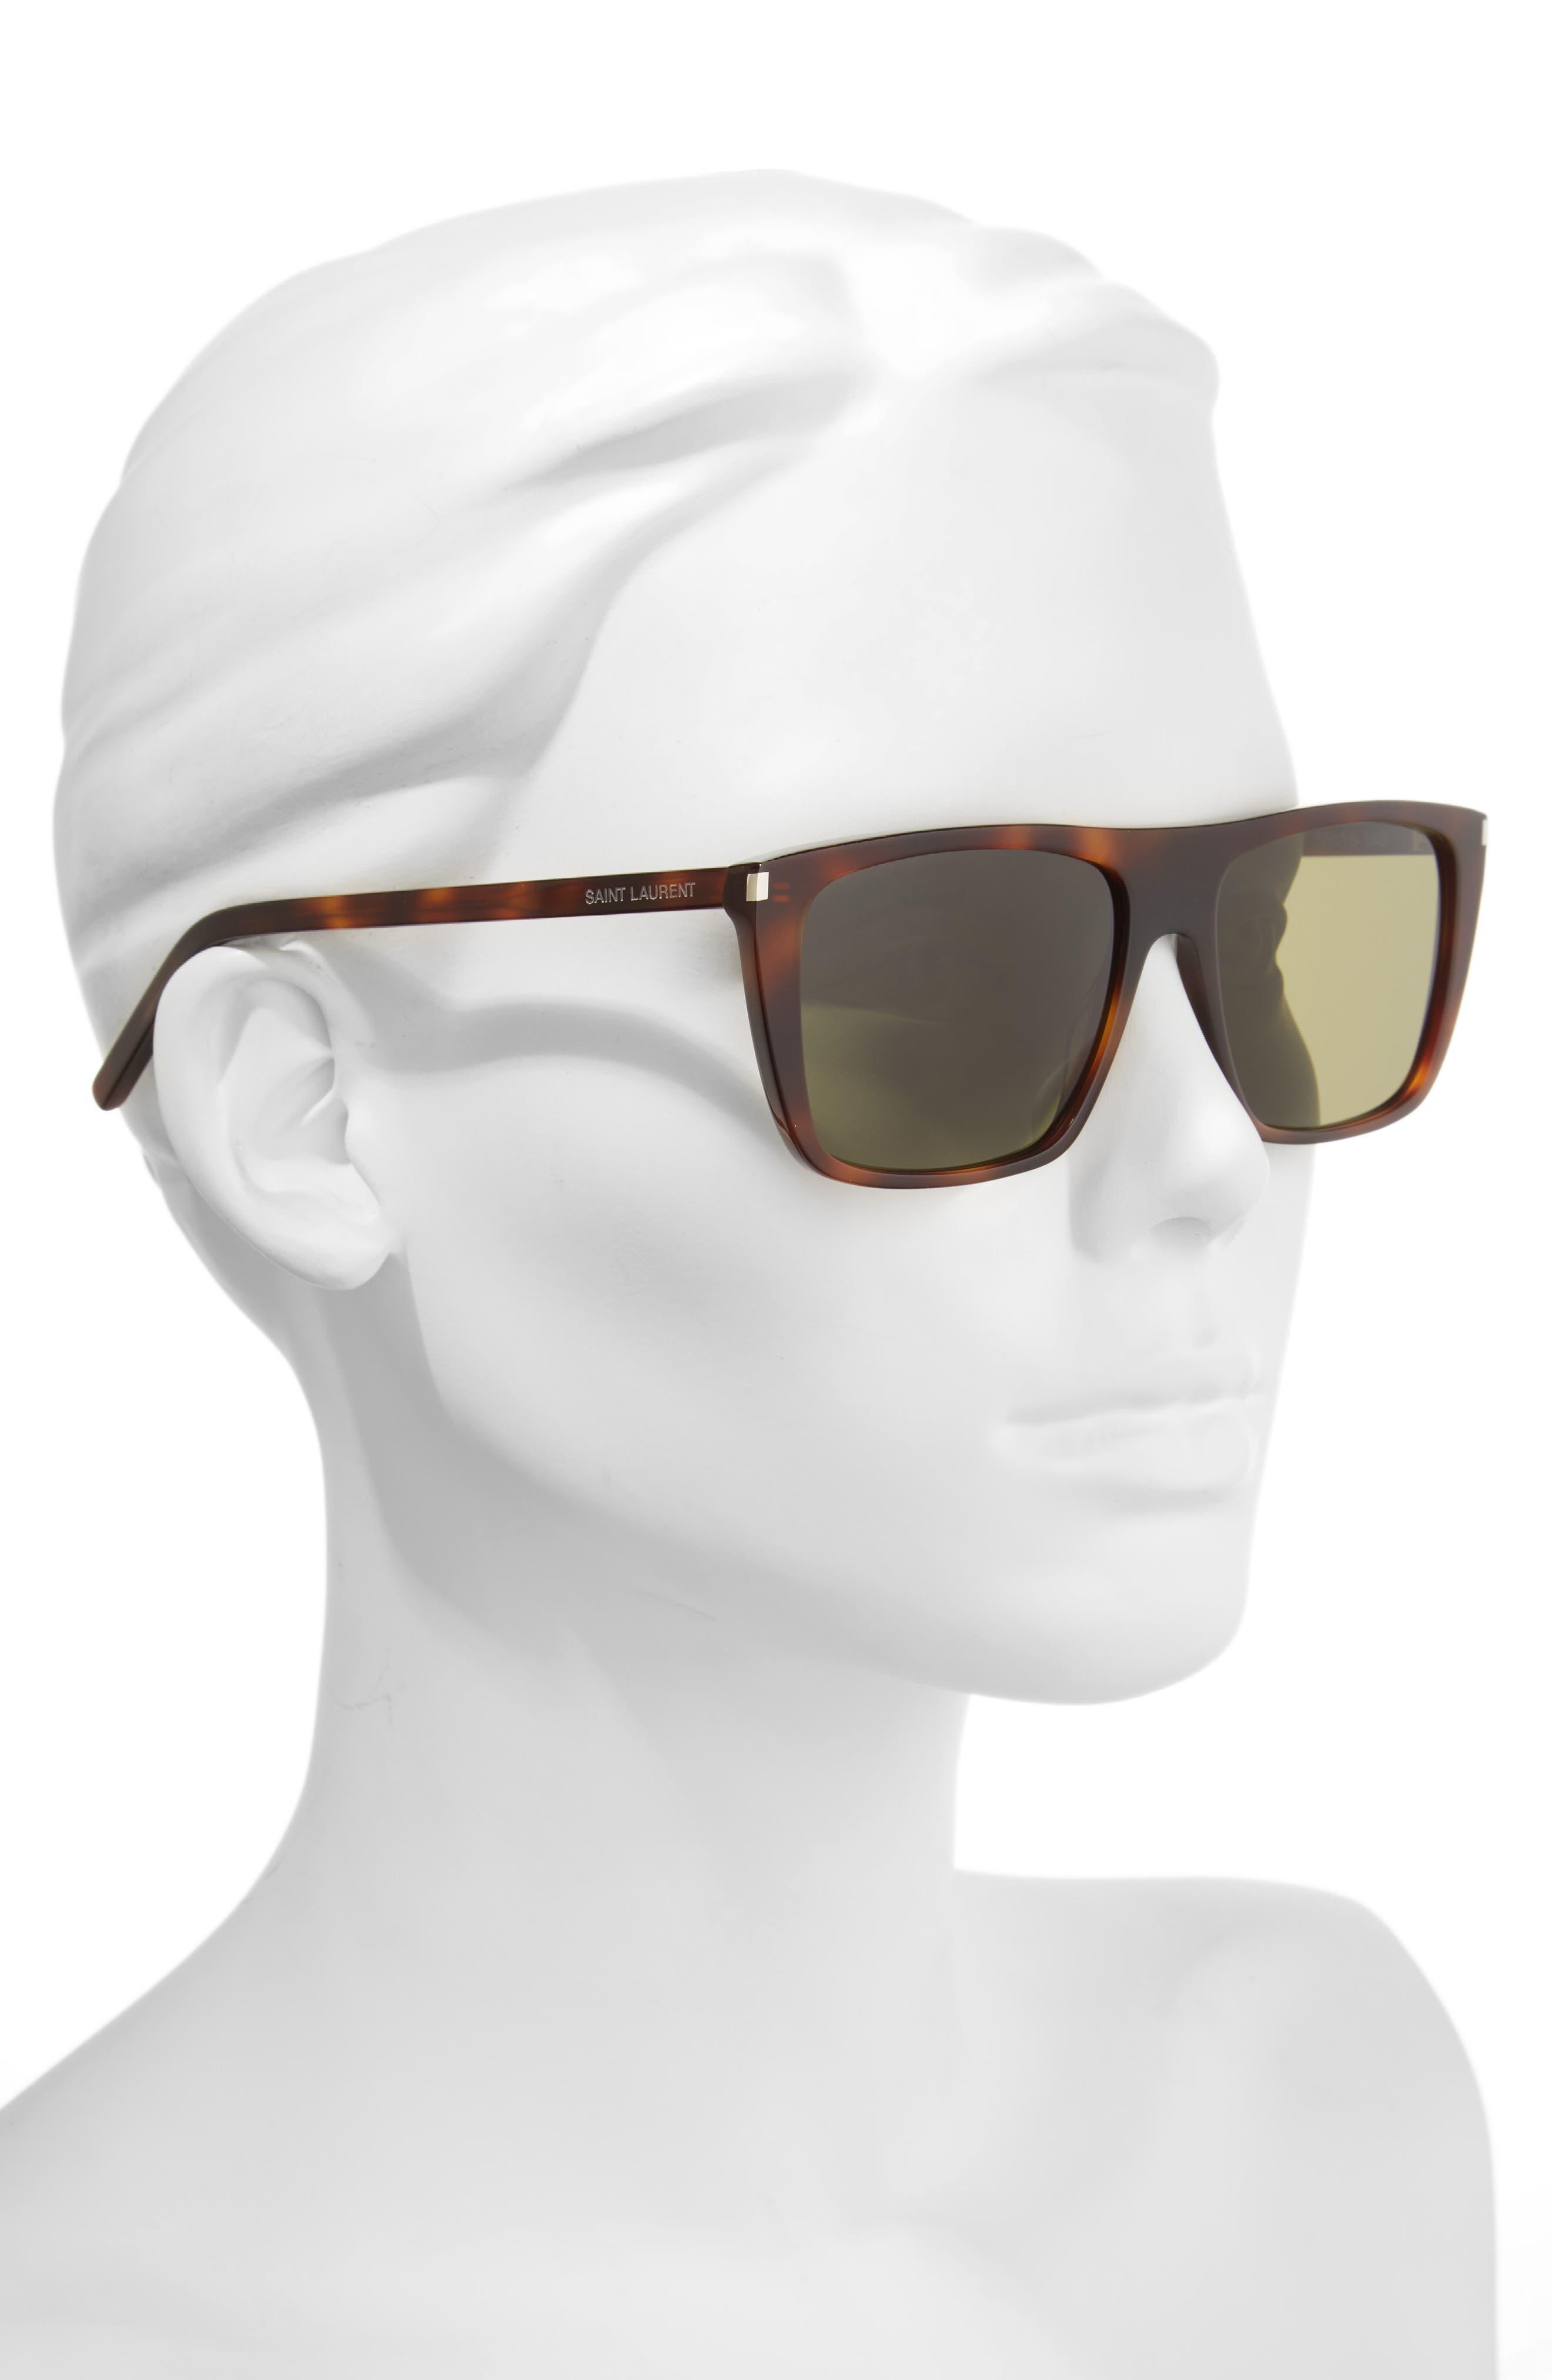 Avana 56mm Flat Top Sunglasses,                             Alternate thumbnail 2, color,                             Havana